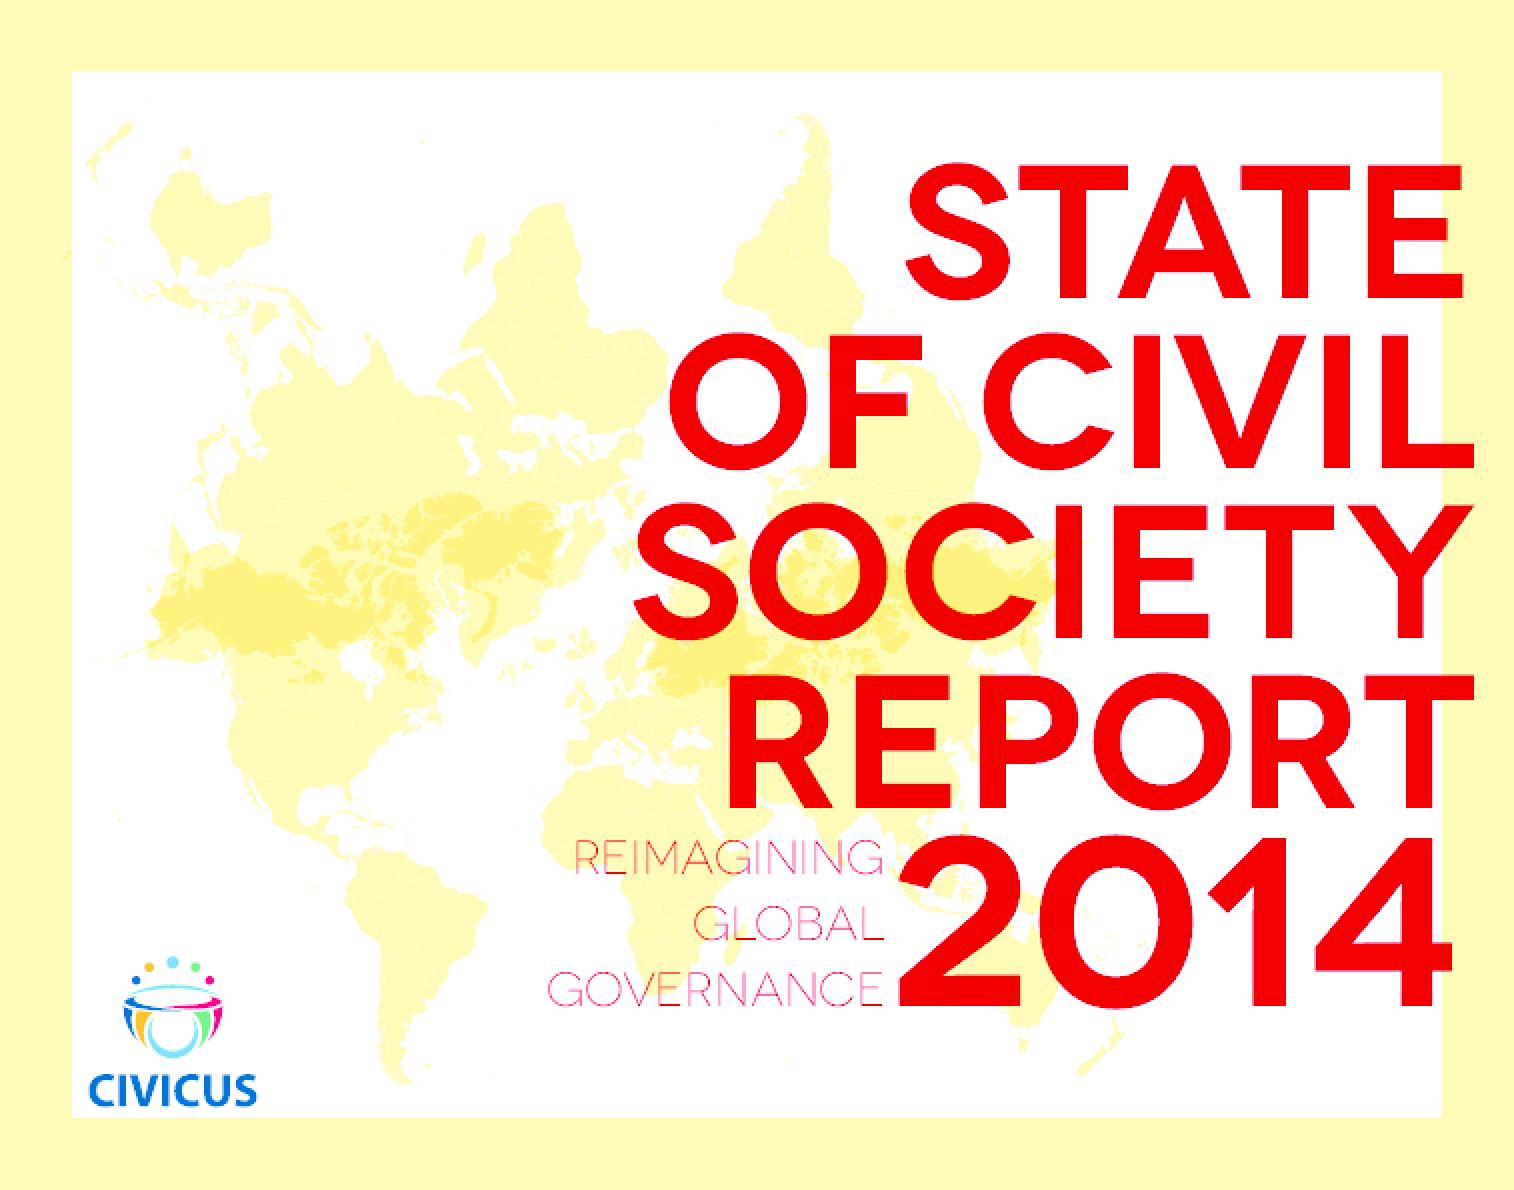 State of Civil Society 2014: Reimagining Global Governance